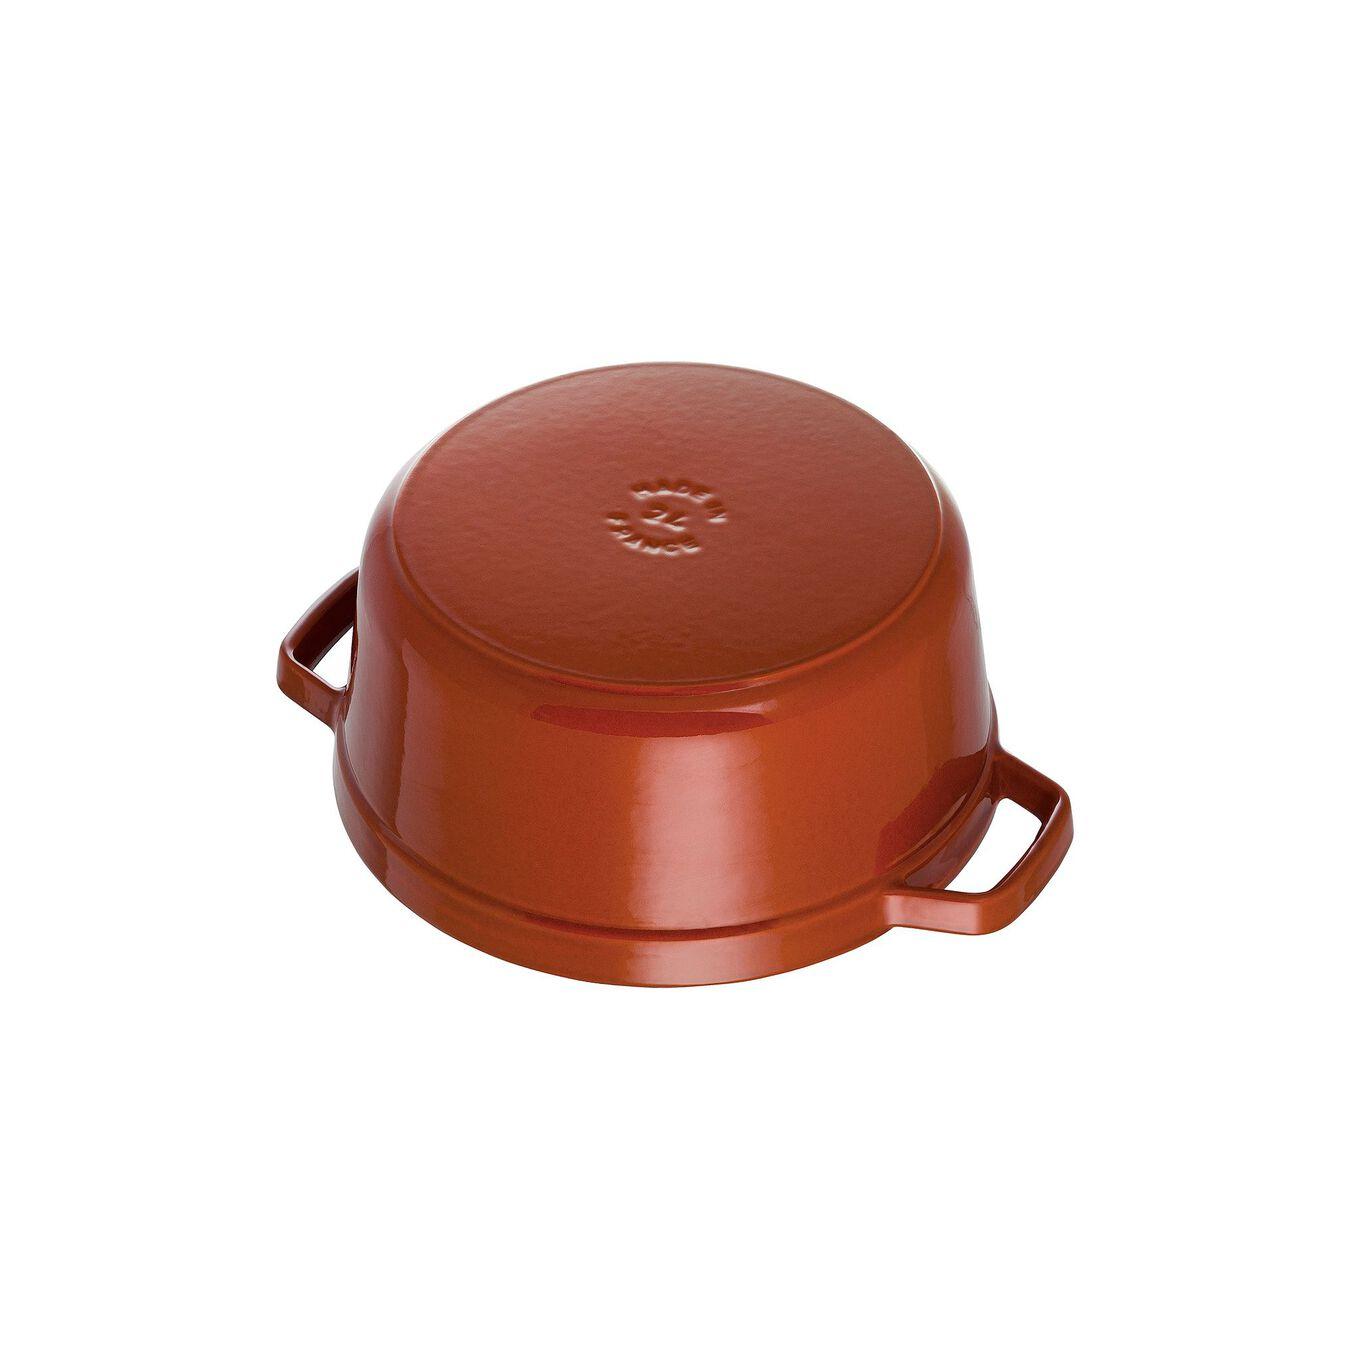 4-qt Round Cocotte - Burnt Orange,,large 2